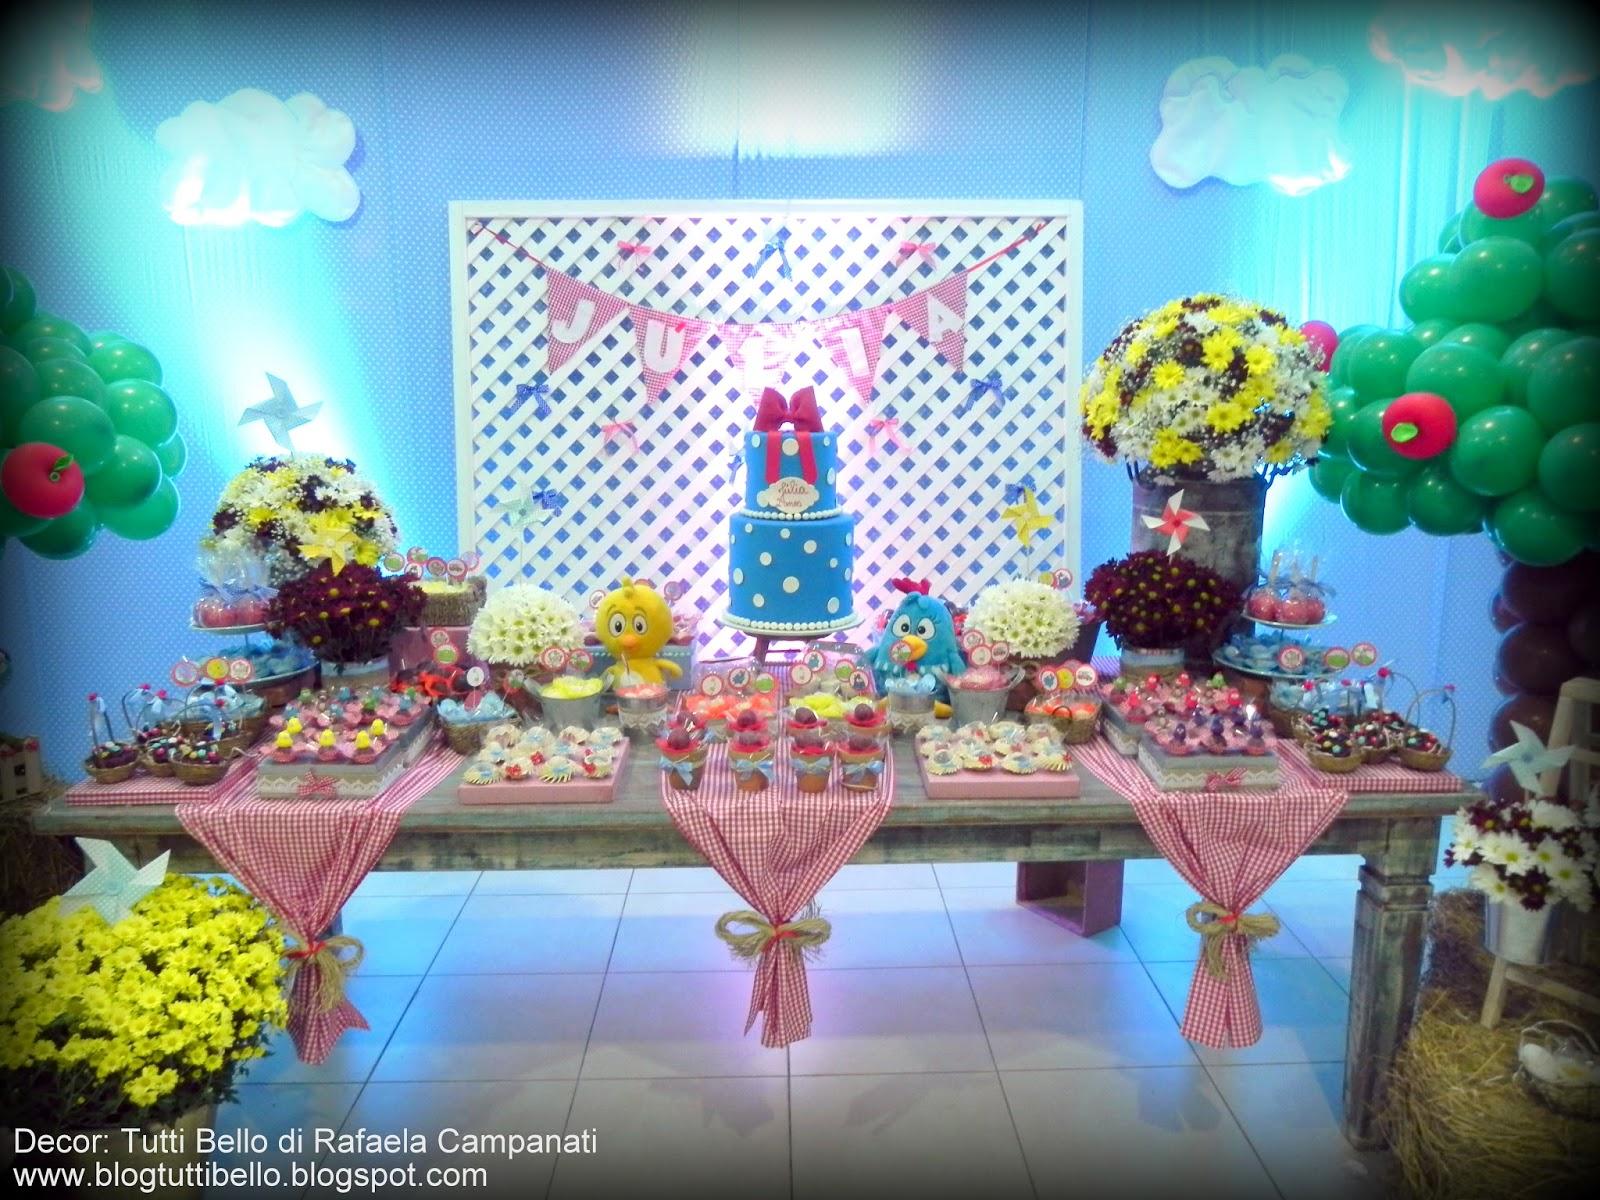 Tutti Bello di Rafaela Campanati: Decor Infantil: Aniversário da  #0C6A43 1600x1200